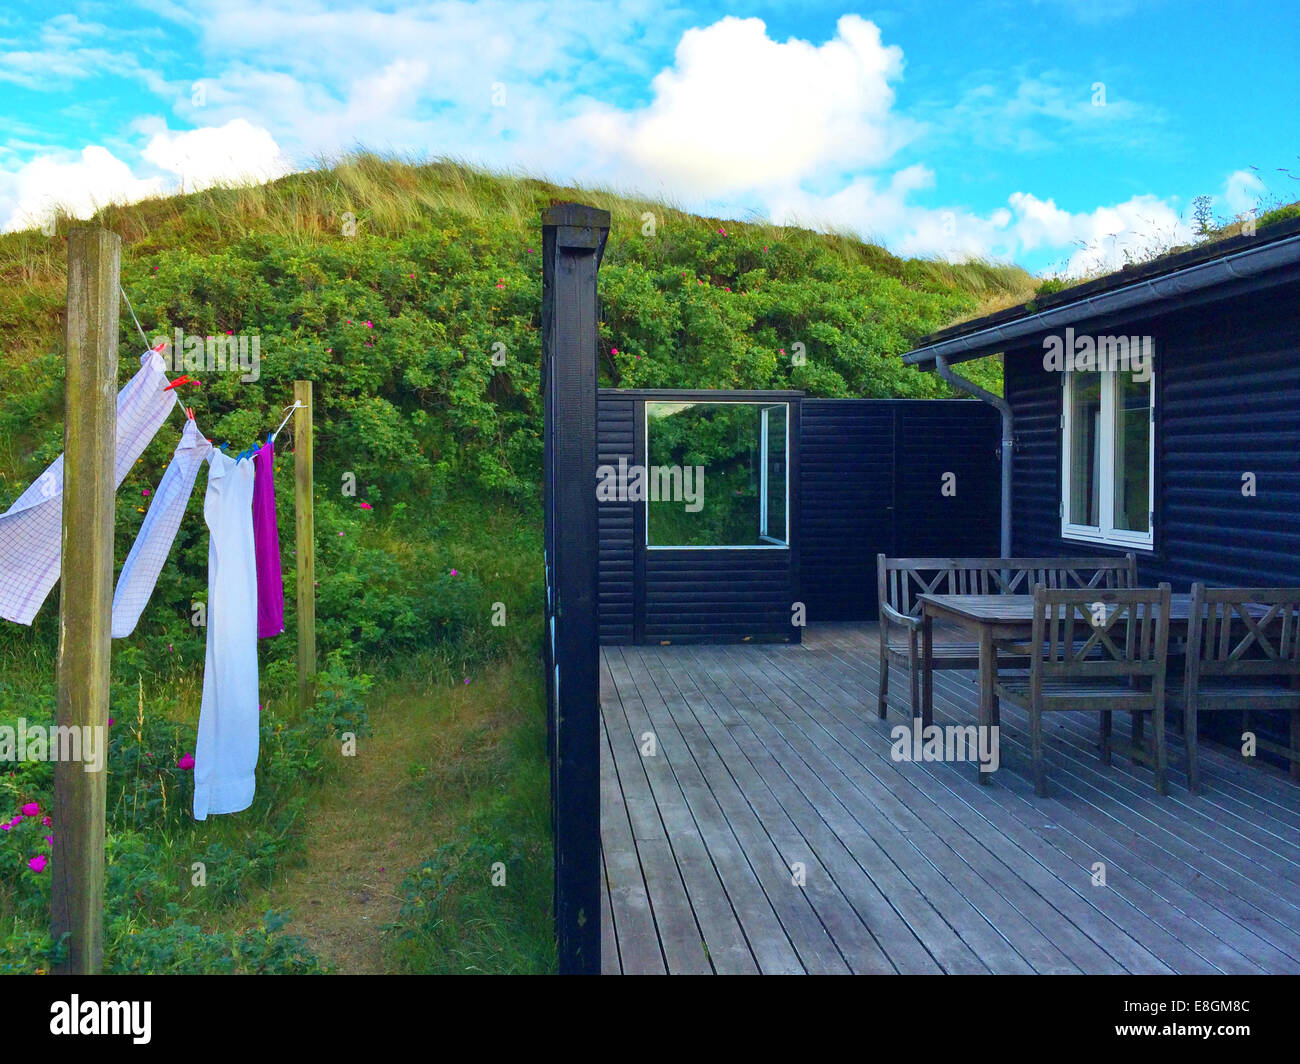 Towels hanging on washing line outside summerhouse, Fanoe, Denmark - Stock Image